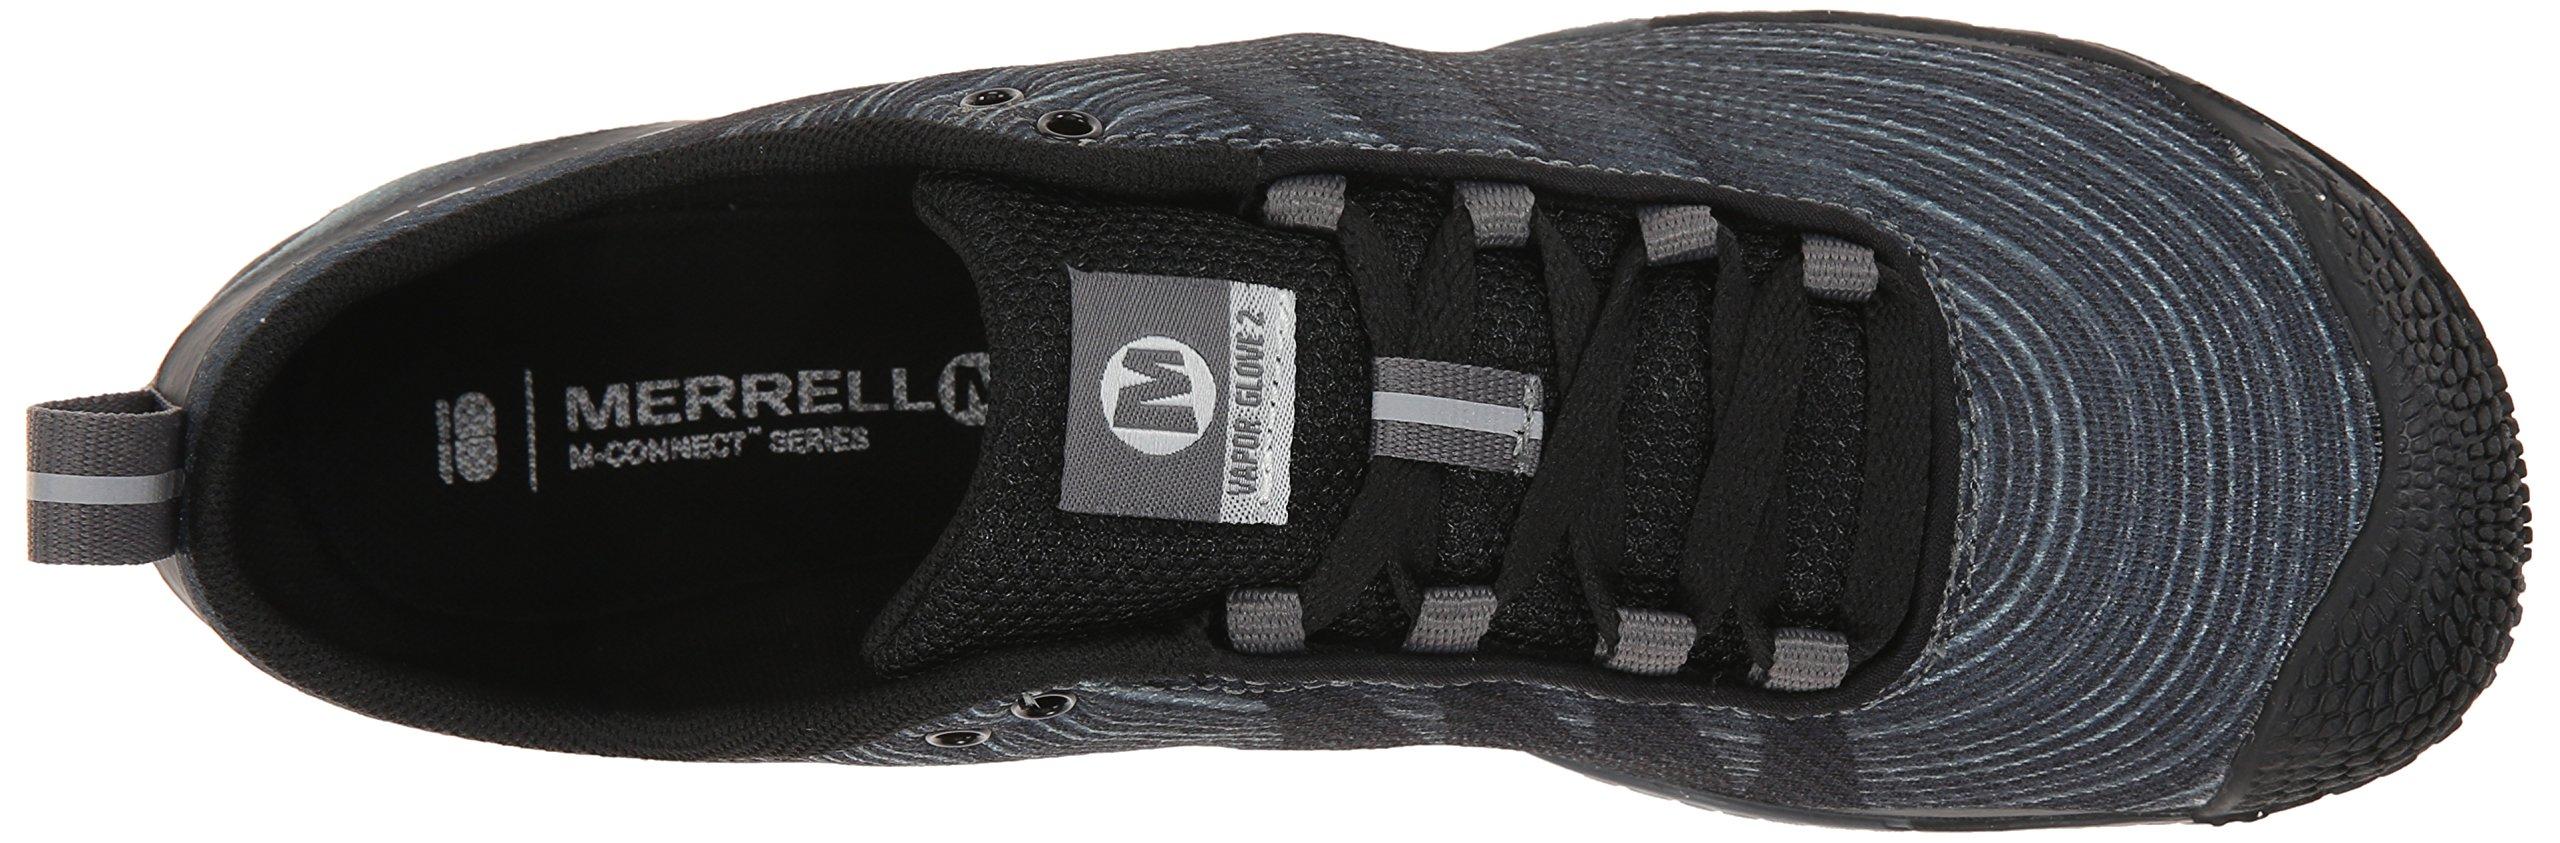 Merrell Women's Vapor Glove 2 Trail Running Shoe, Black/Castle Rock, 6 M US by Merrell (Image #8)